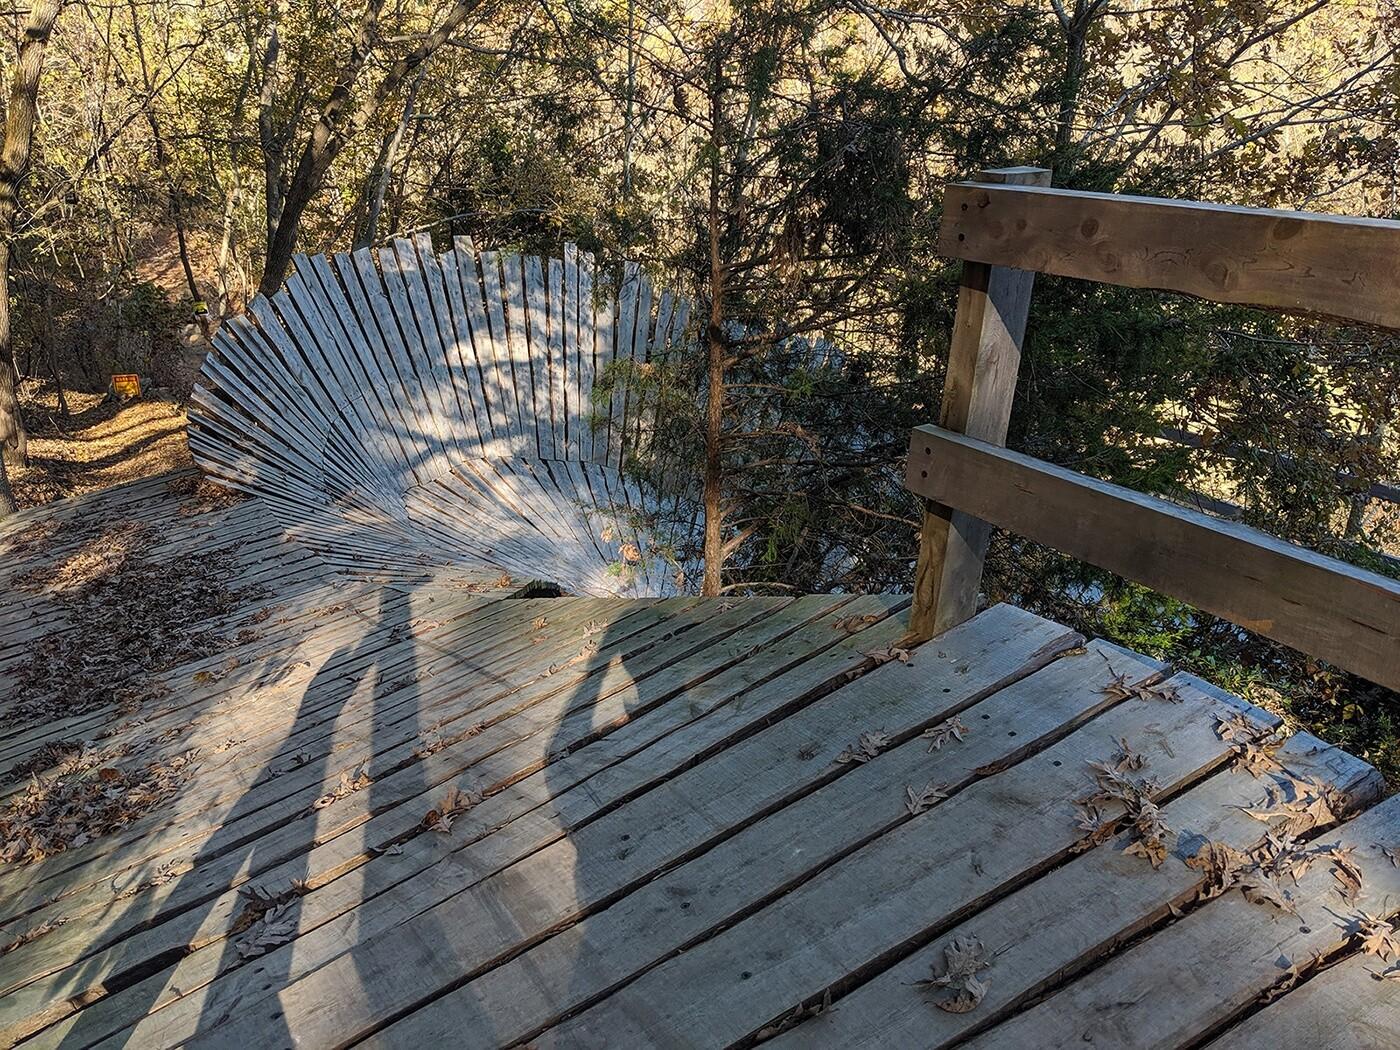 A freeride trail in Bentonville, AR.